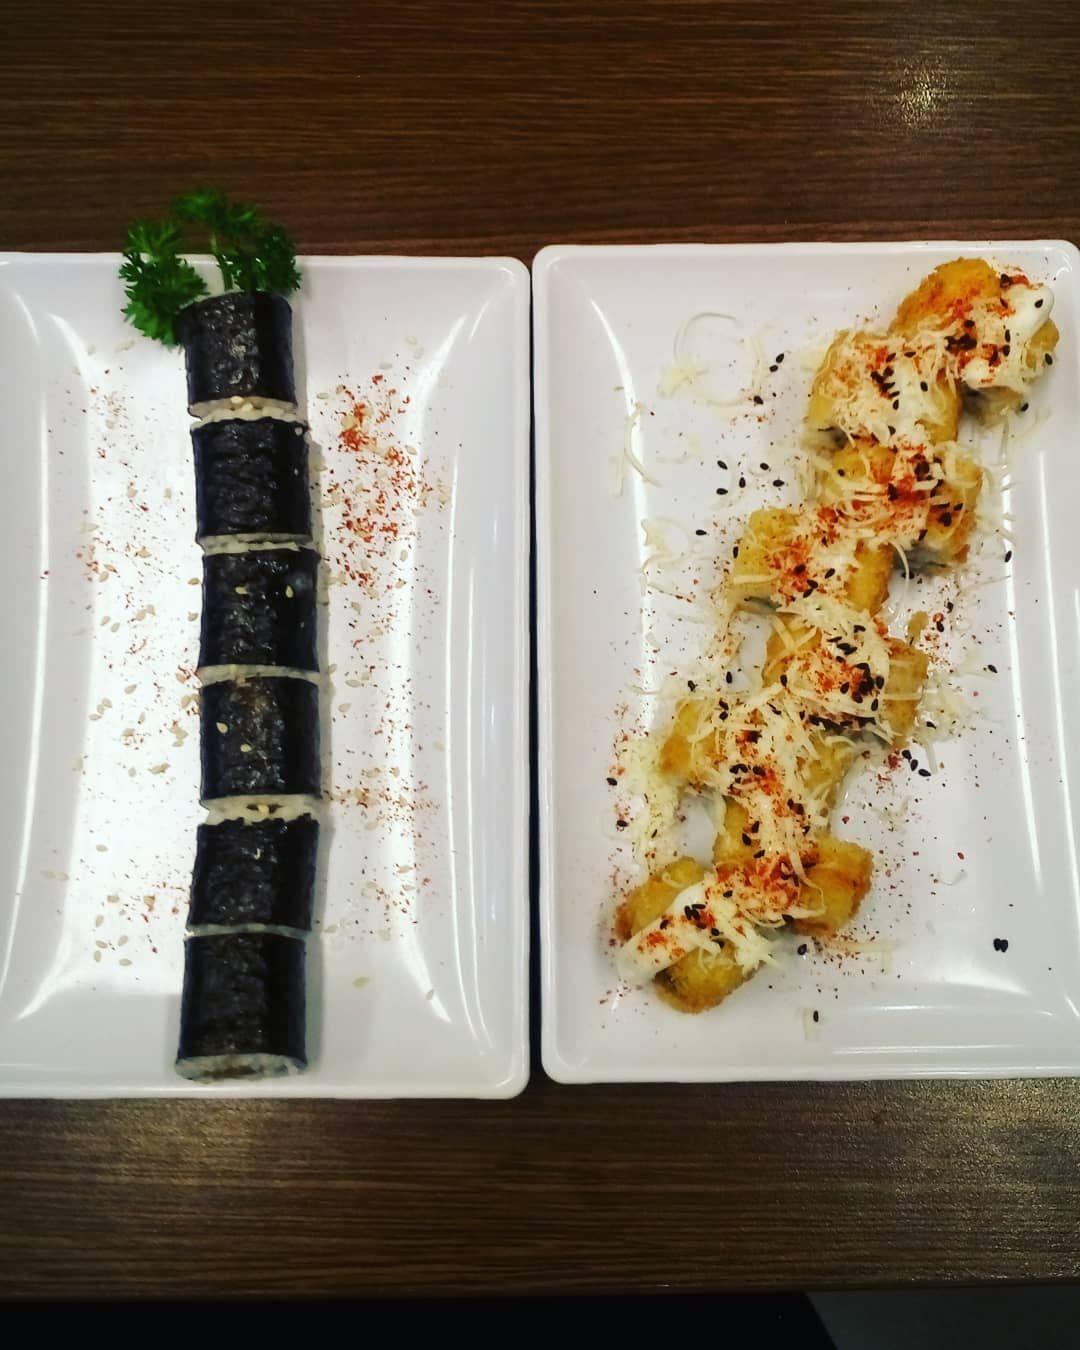 [New] The 10 All-Time Best Home Decor (in the World) -  .  SUSHI NORI BOGOR  Superindo Kincan Jati Bening Jakarta Superindo Pahlawan Bogor Atau bisa juga diorder lewat Gofood atau Grabfood #yummy #sushi #gofood atau #grabfood #superindo #kincanjatibening #sushilover #sushitime #sushiroll #sushimania #sushiclub #pahlawanbogor #cikaretcibinong #sushienak #sushimurah #sushihalal #sushidelivery #jajanansushimurah #kulinersushi #kulinersushimurah